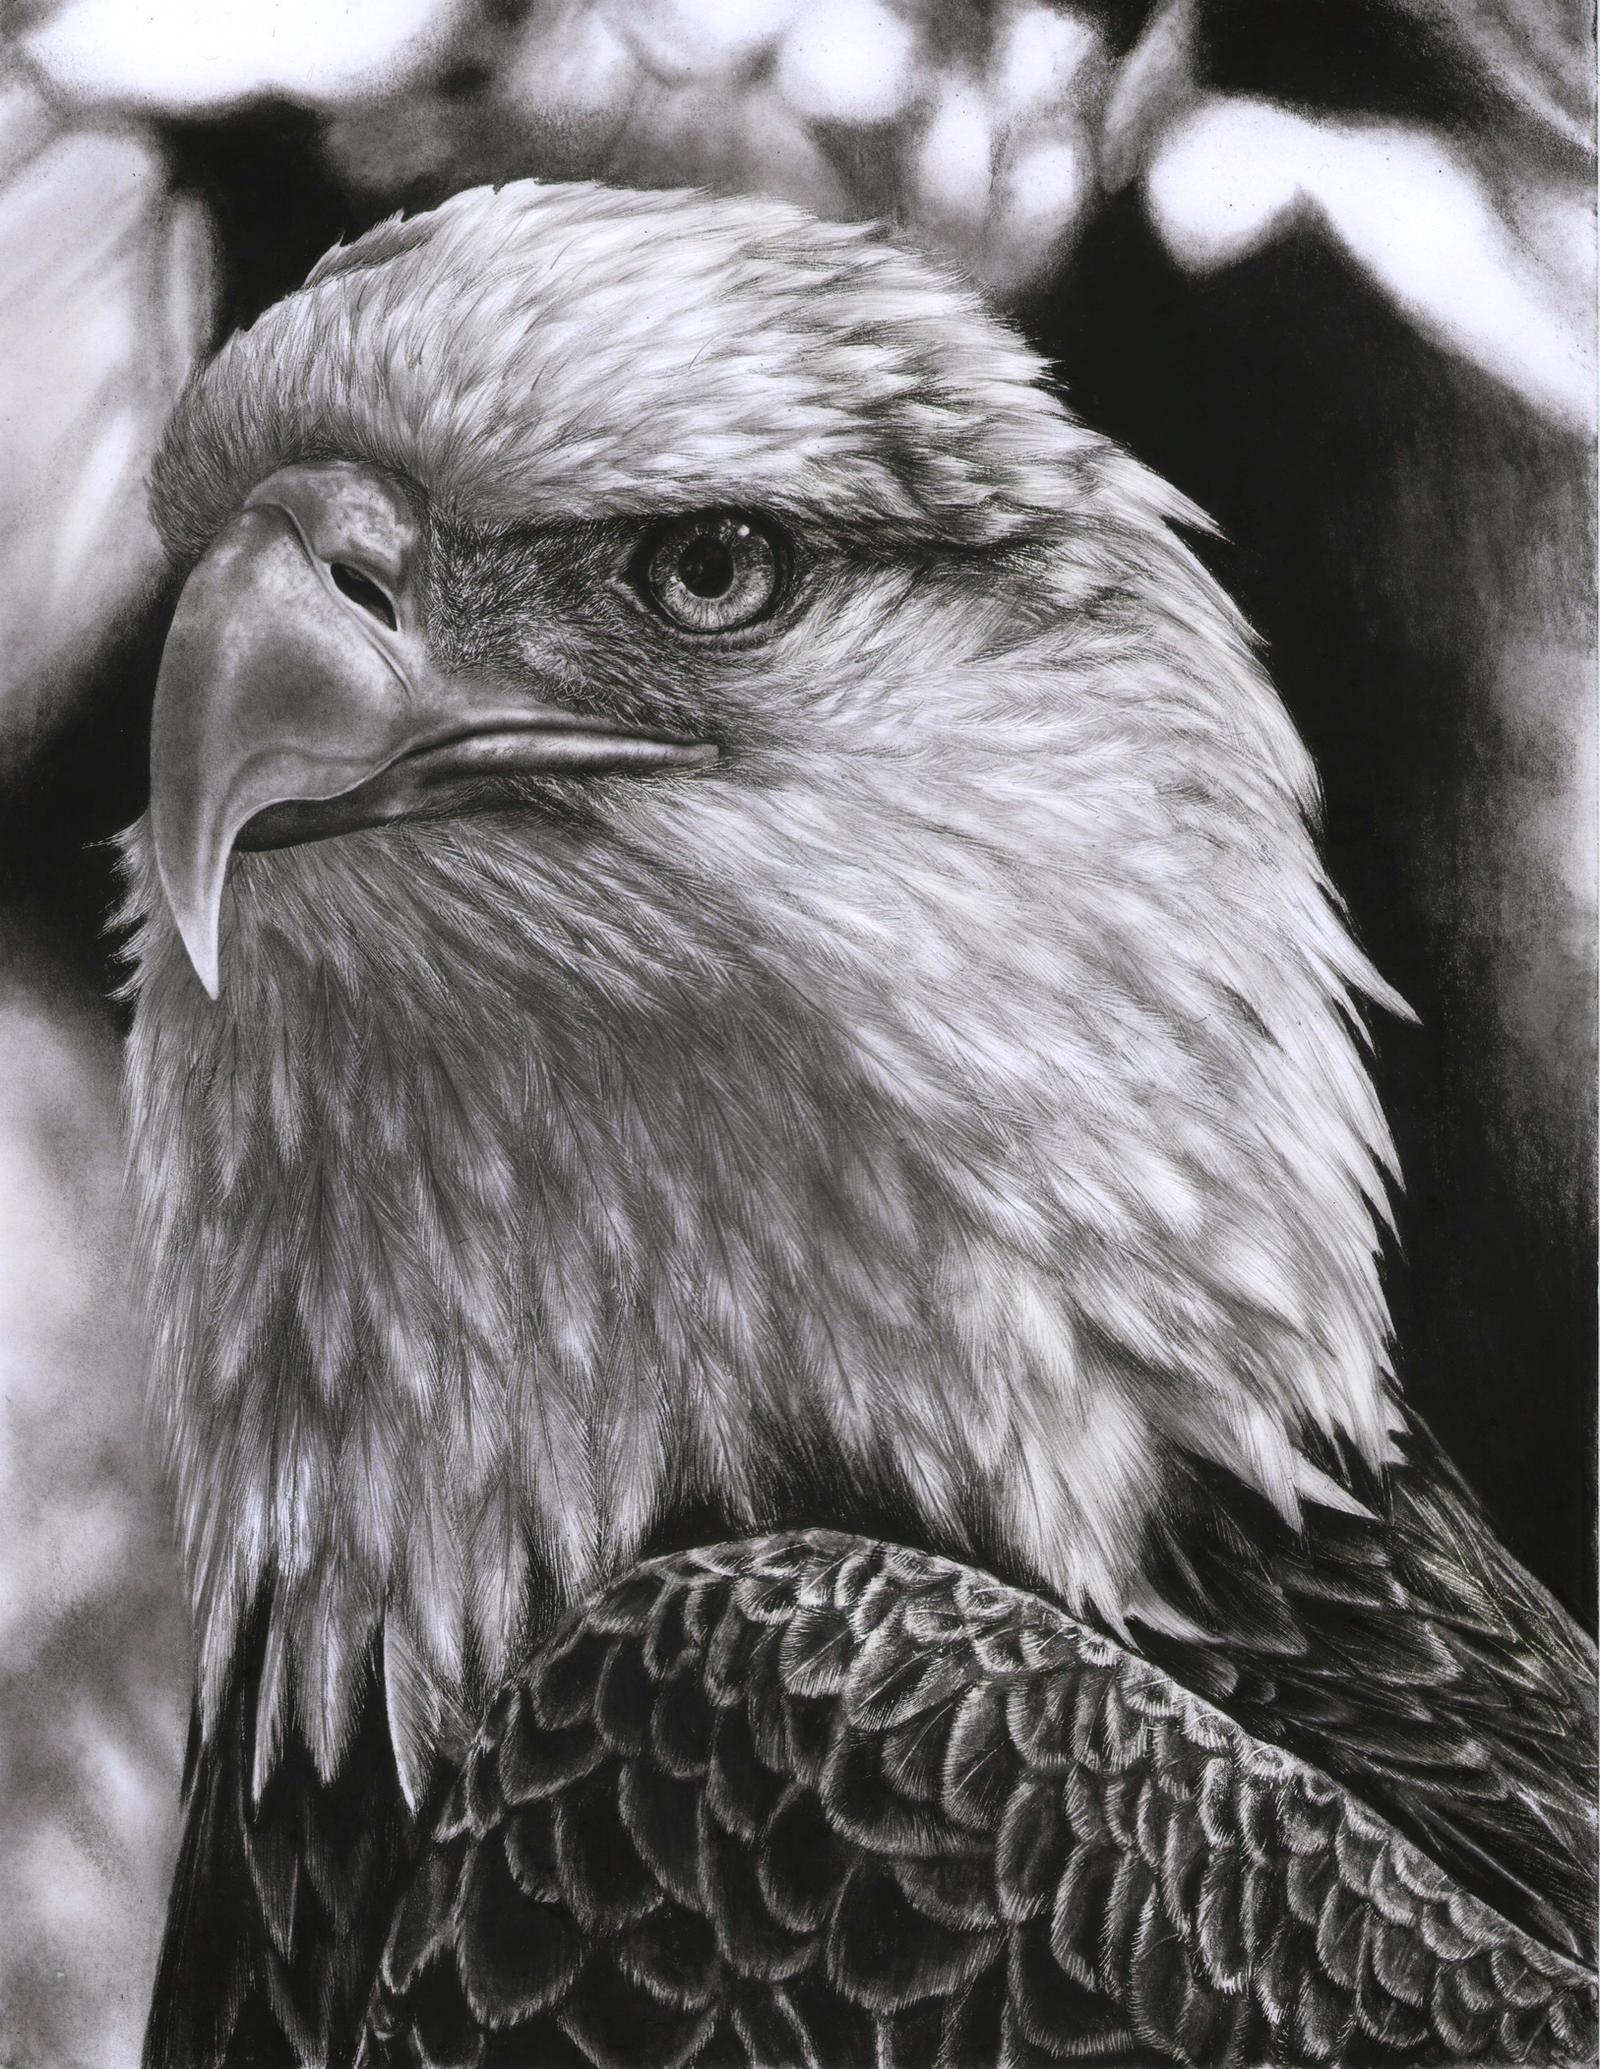 Dibujo Aguila. Affordable Resultado De Imagen Para Aguila Dibujo ...